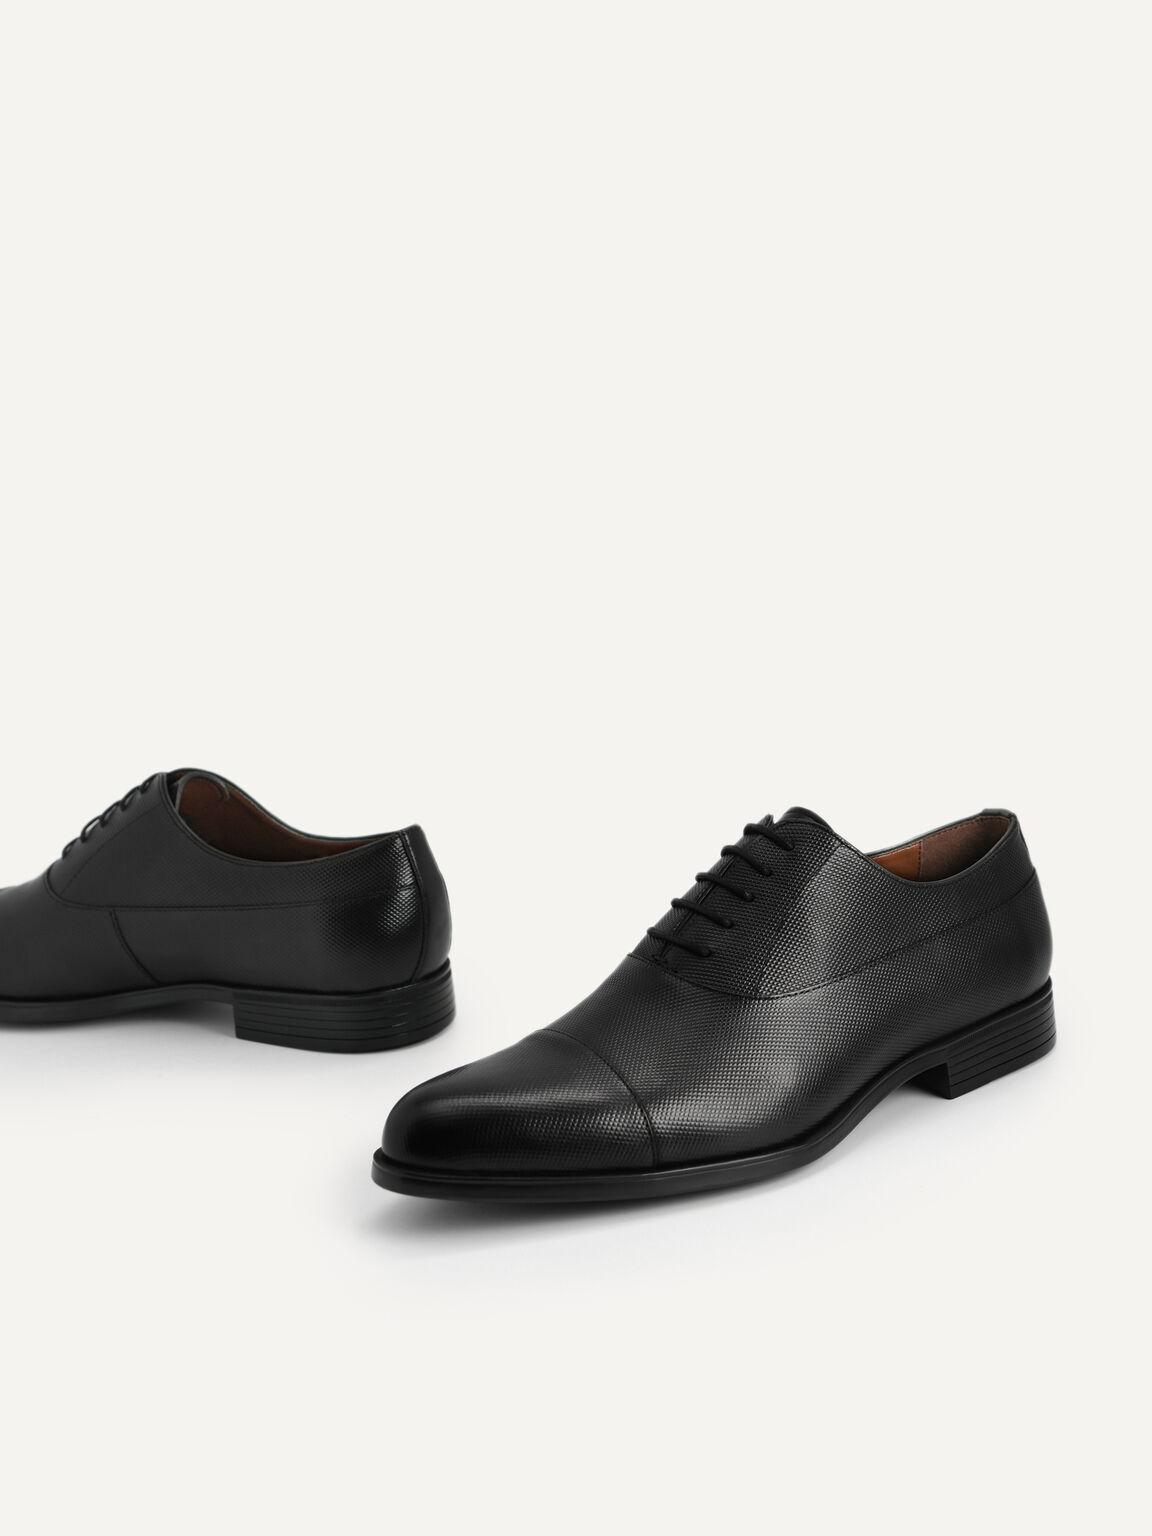 Textured Leather Cap Toe Derby Shoes, Black, hi-res